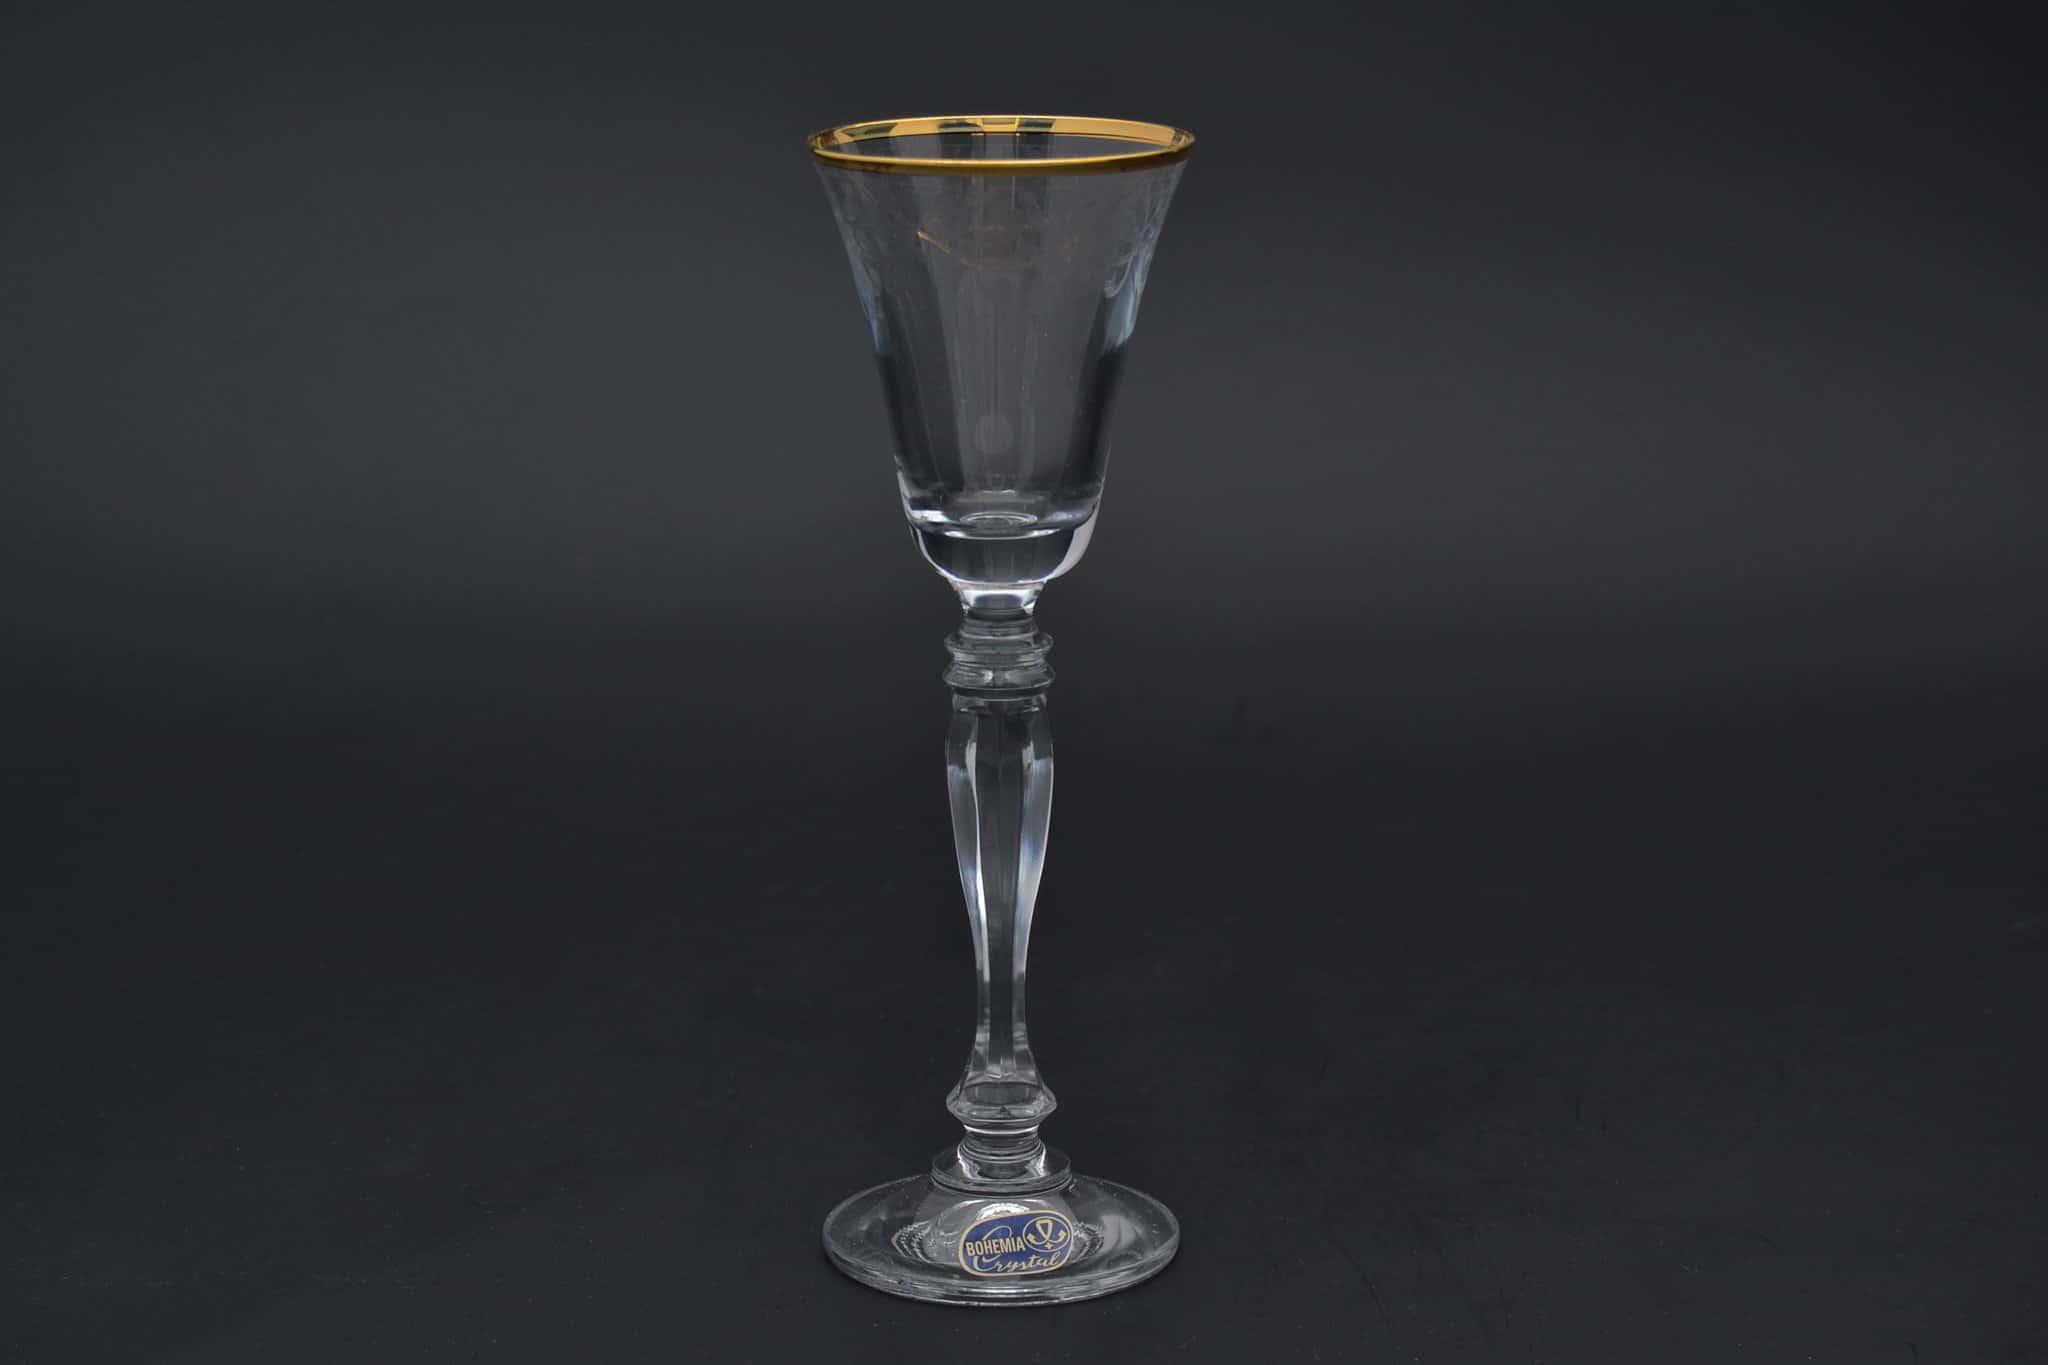 Фужер для водки Кристалекс 50 мл (1 шт)